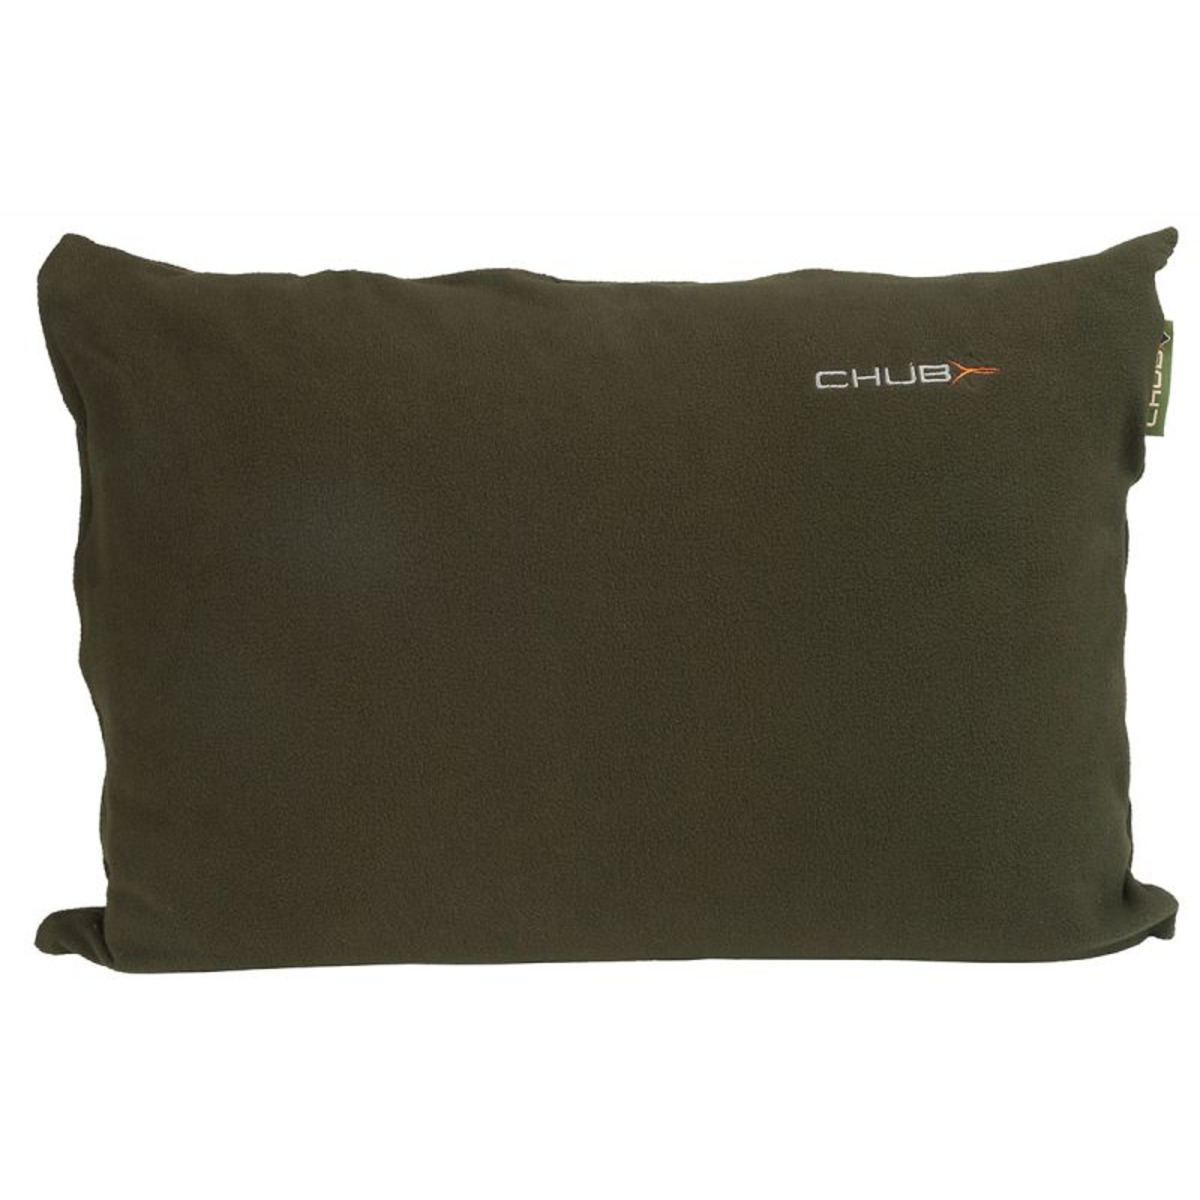 Chub Bedchair Pillow - Large - 45x70 cm - 17.7x27.5 in